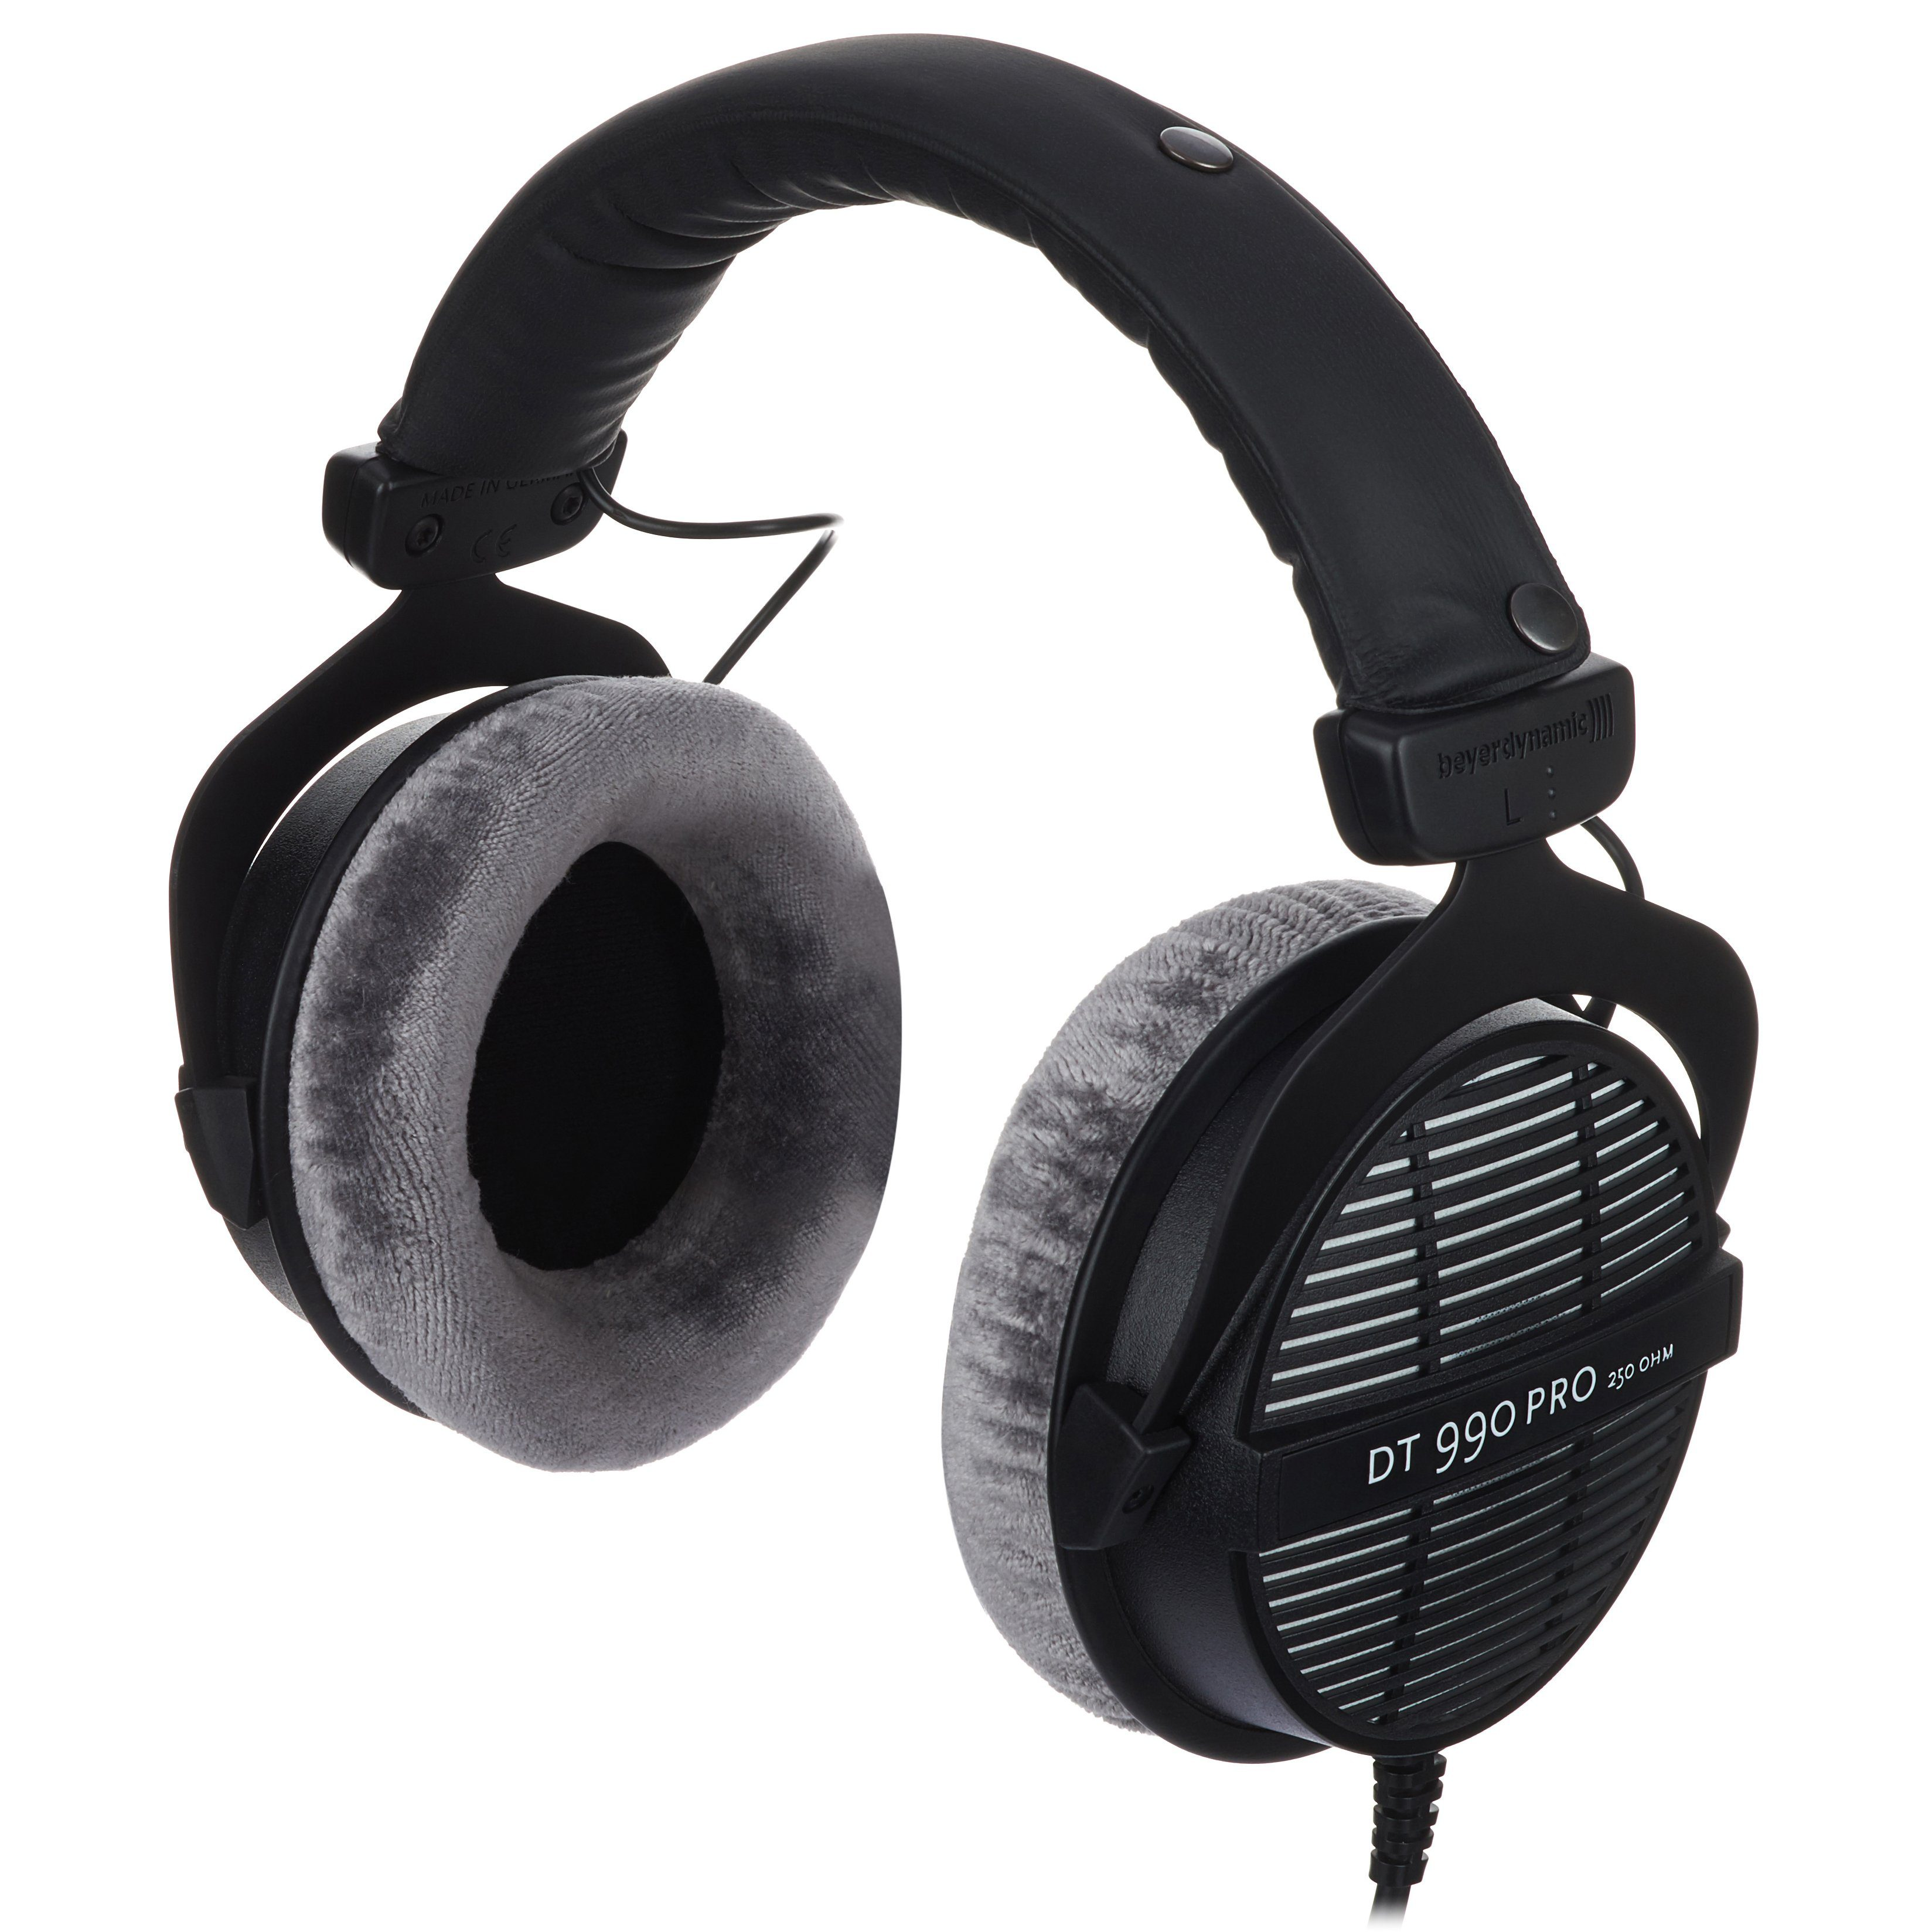 beyerdynamic Dynamic open over headphones DT 990 PRO